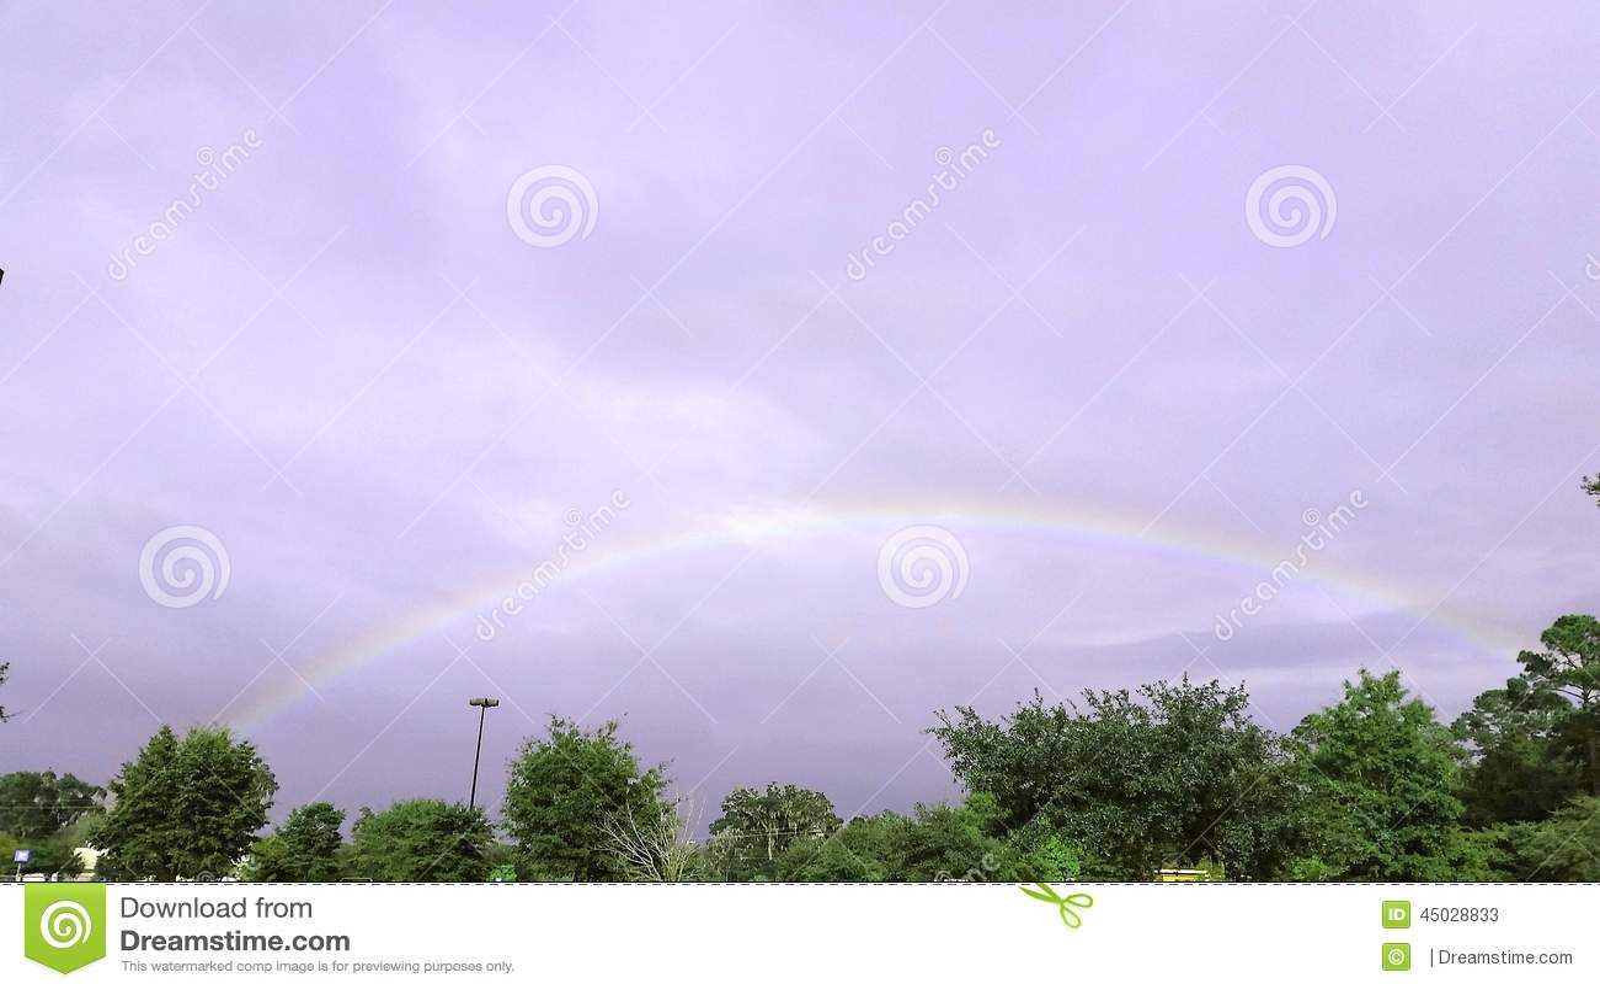 Irgendwo über dem Regenbogen Release Date